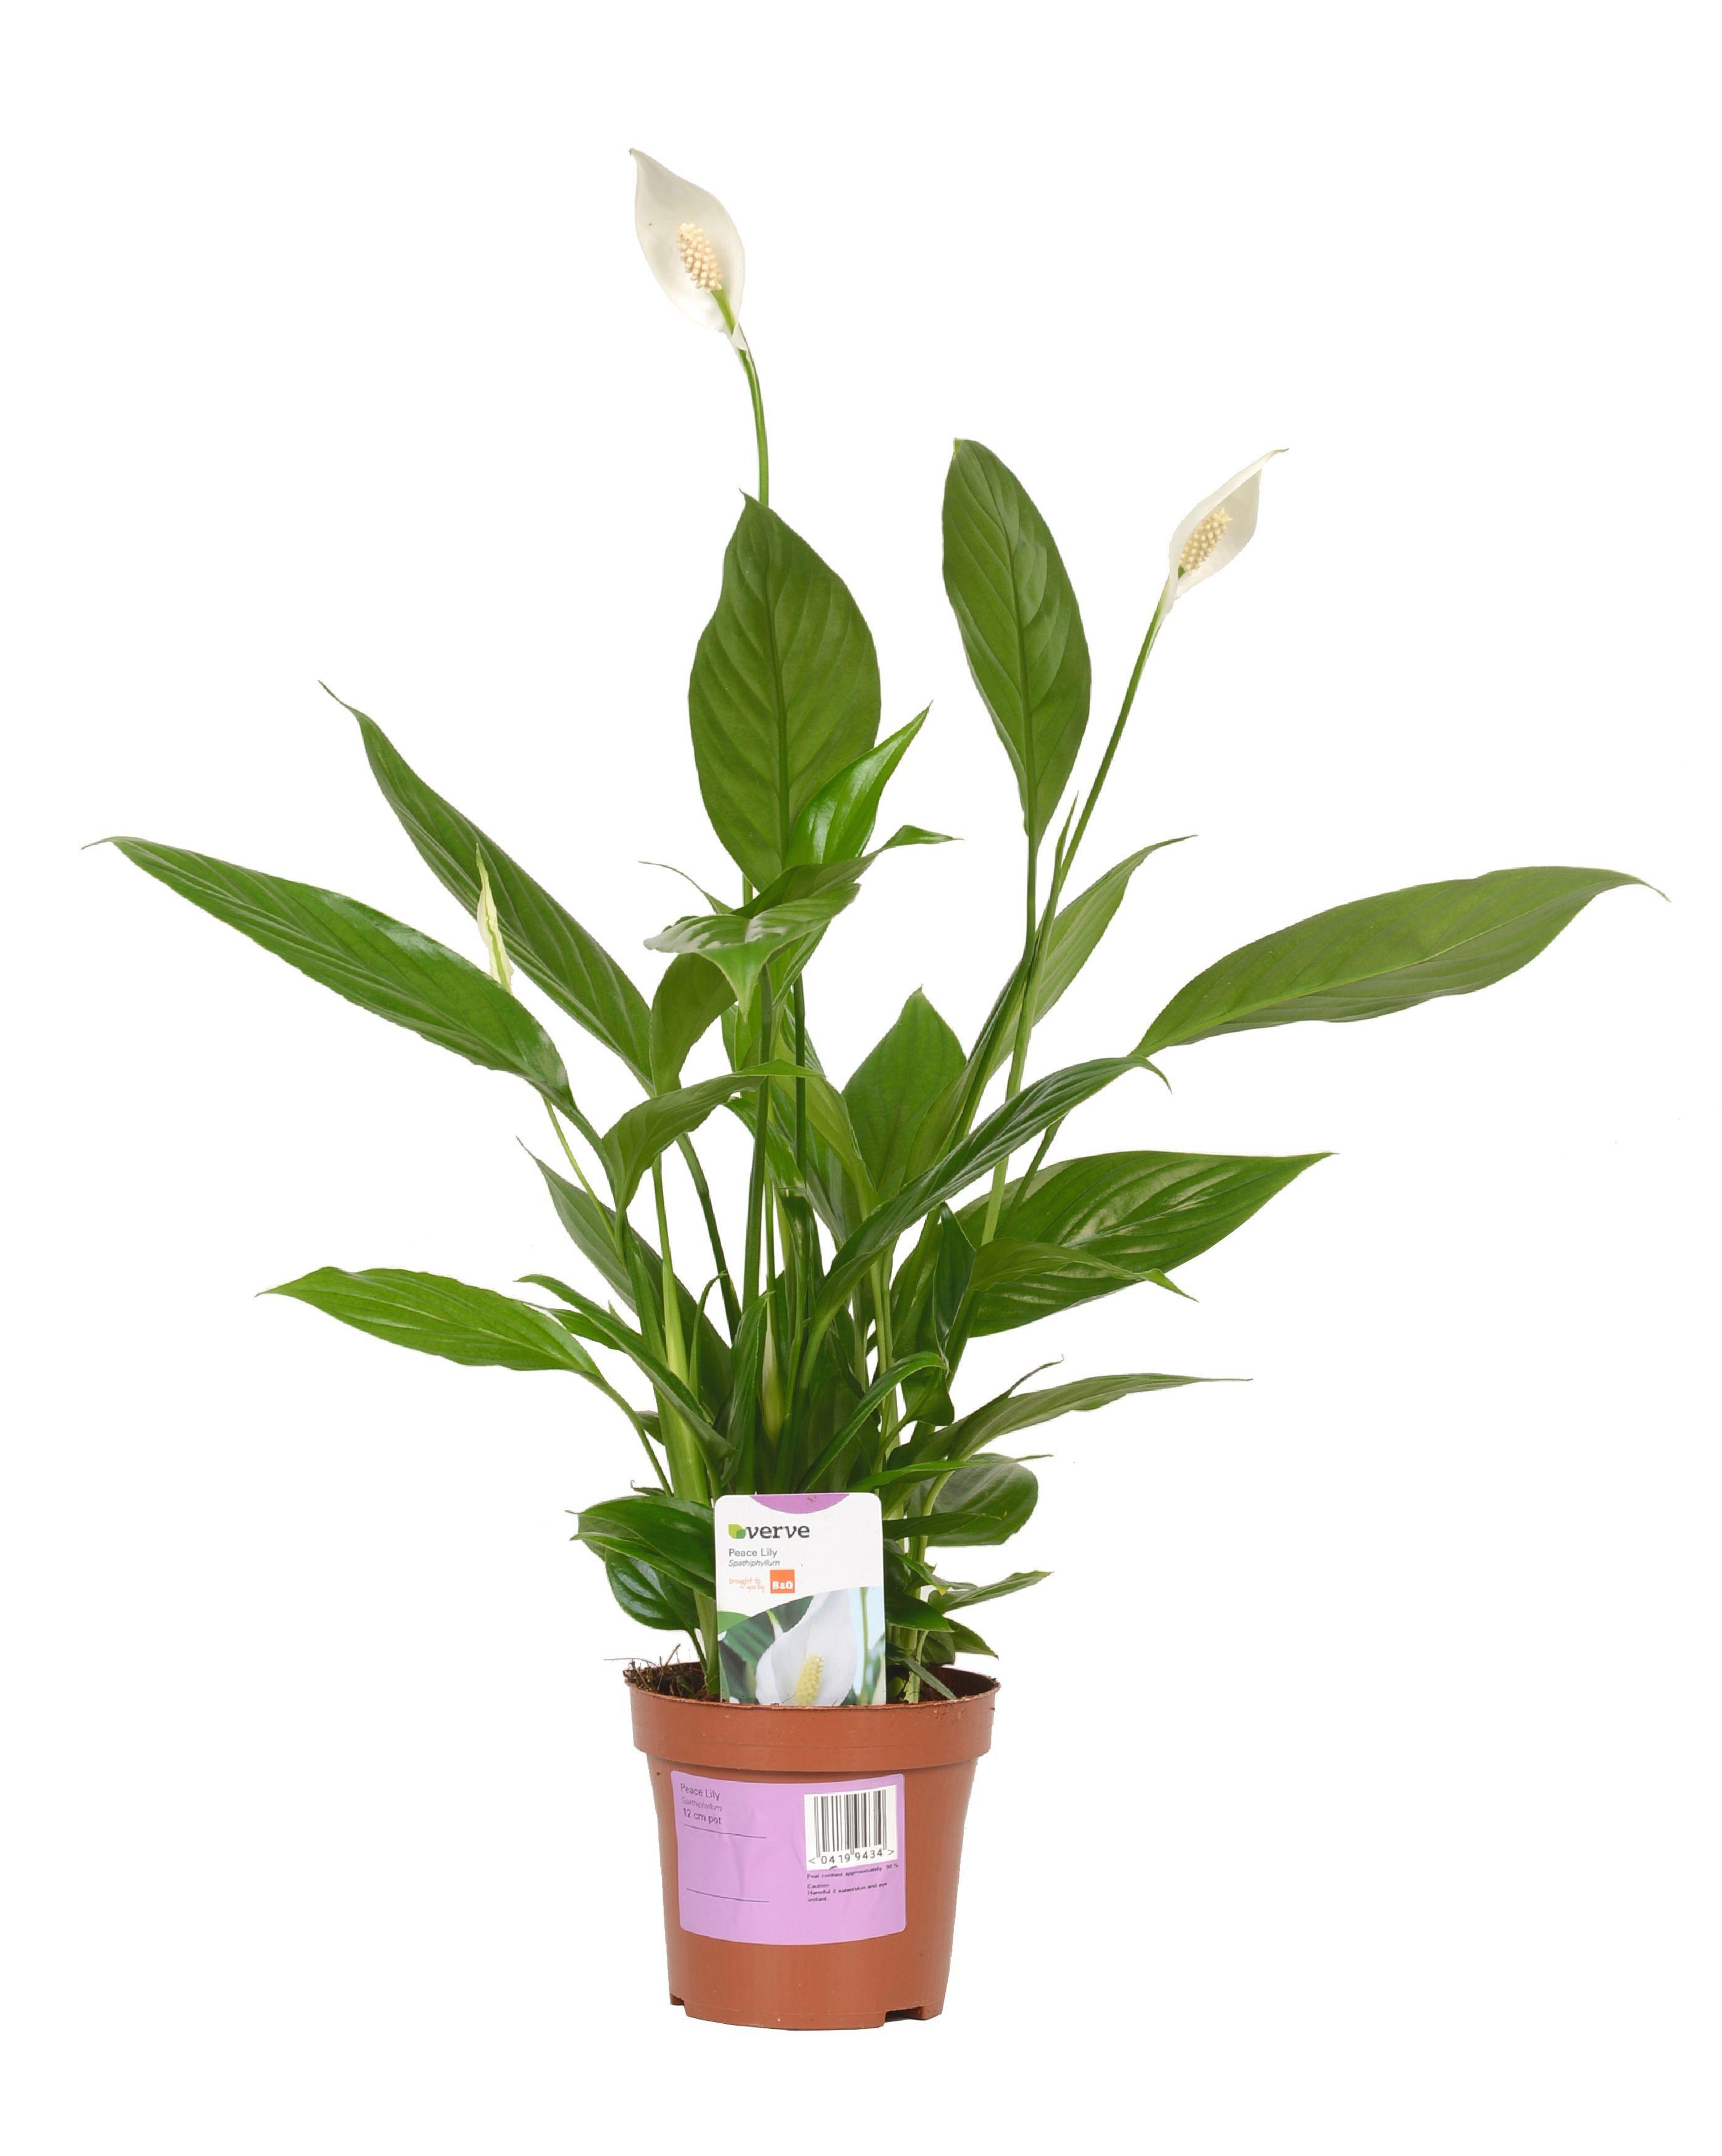 Verve Peace Lily In Plastic Pot Departments DIY At BampQ